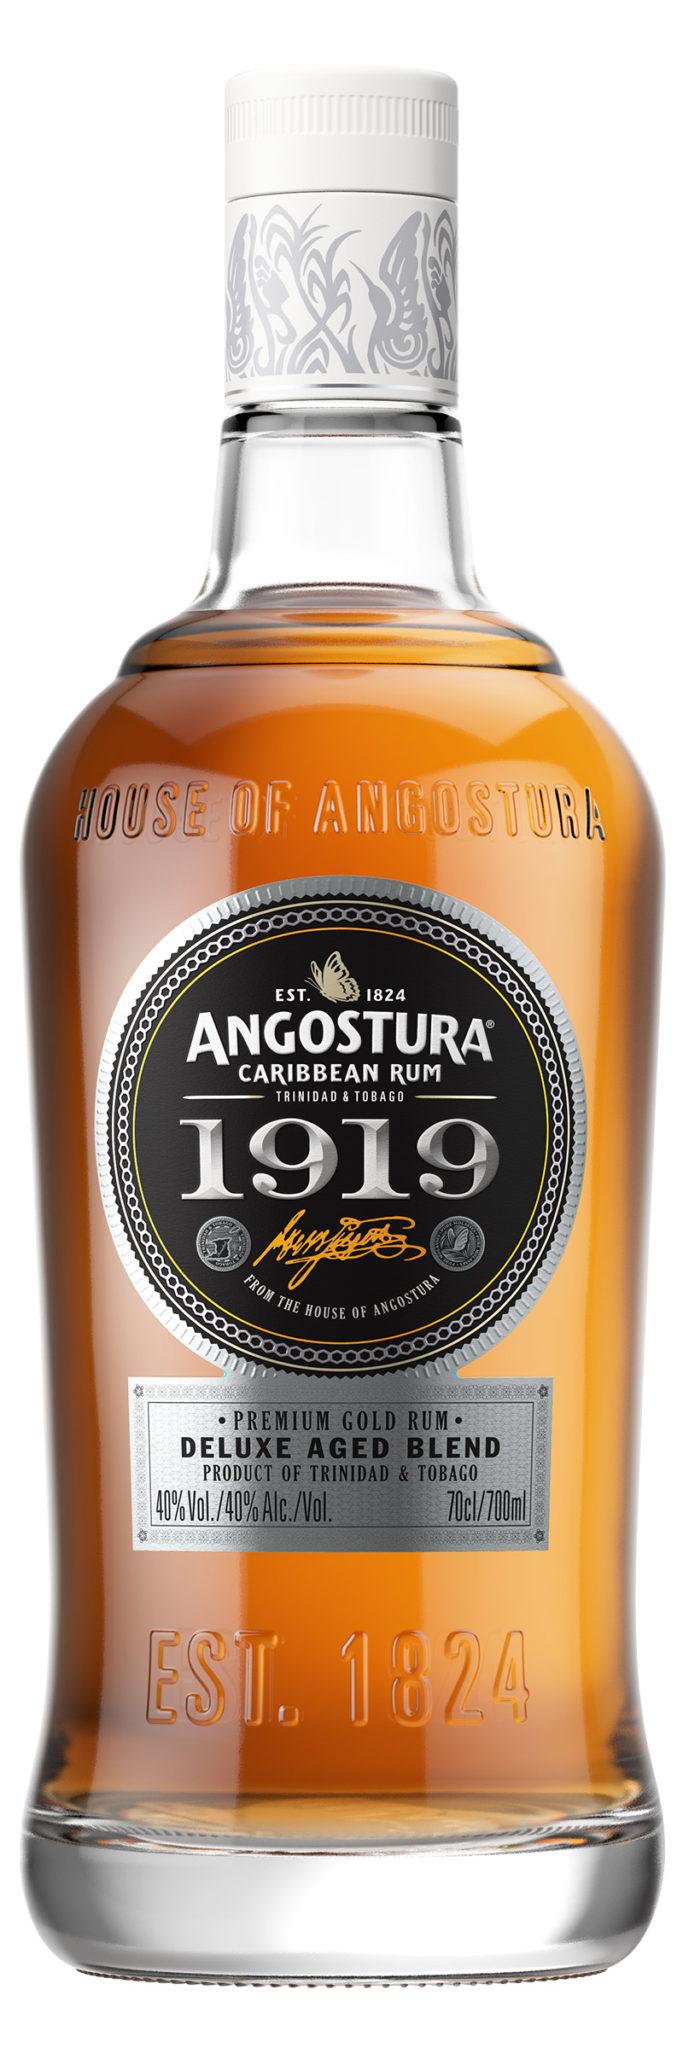 Angostura 1919 Image